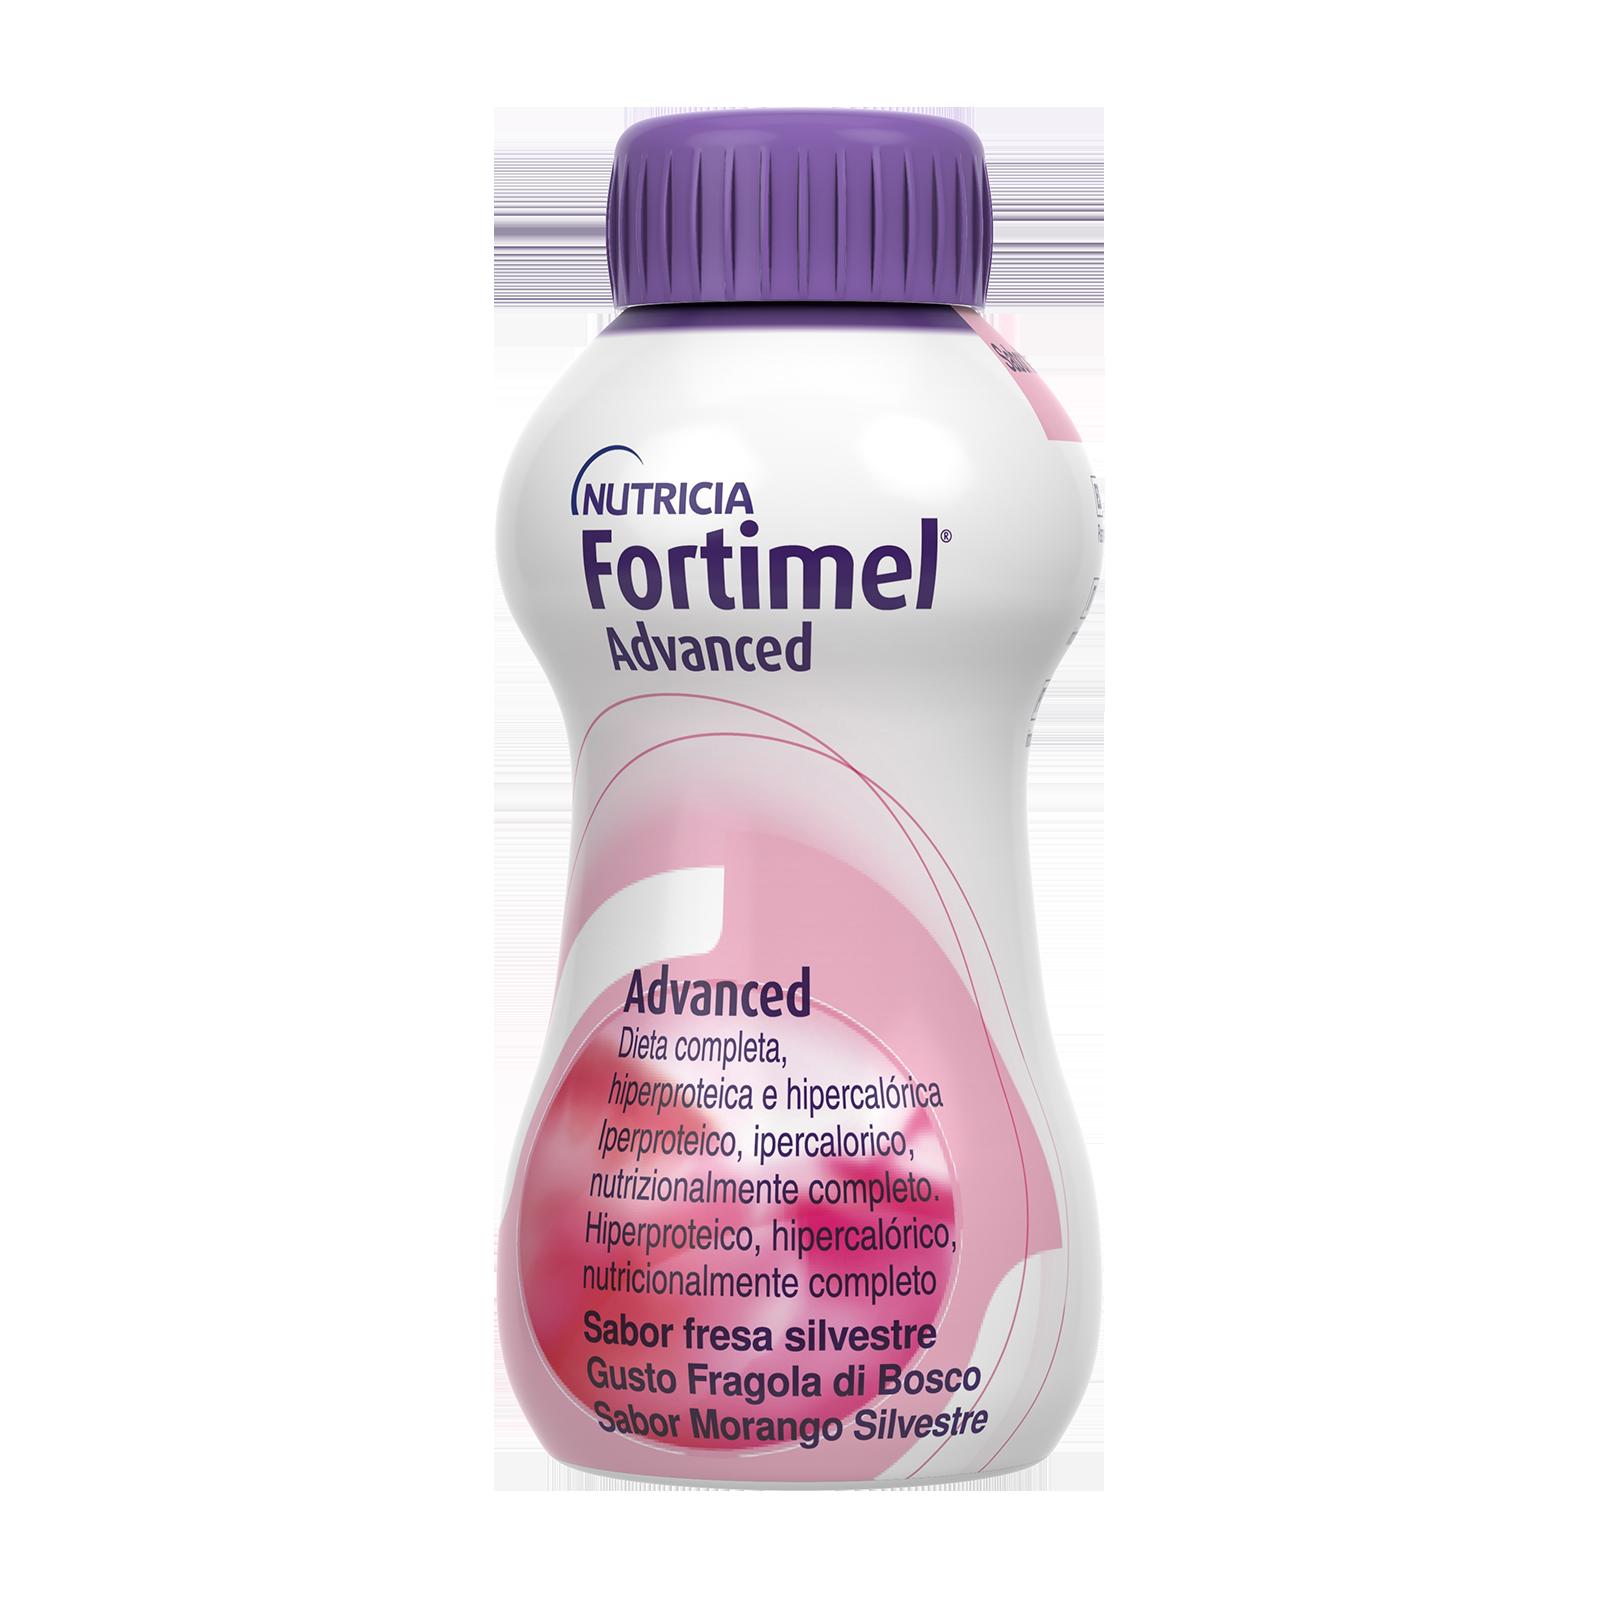 Integratori alimentari - Fortimel Advanced Fragola di bosco 24 bottigliette, Fortimel